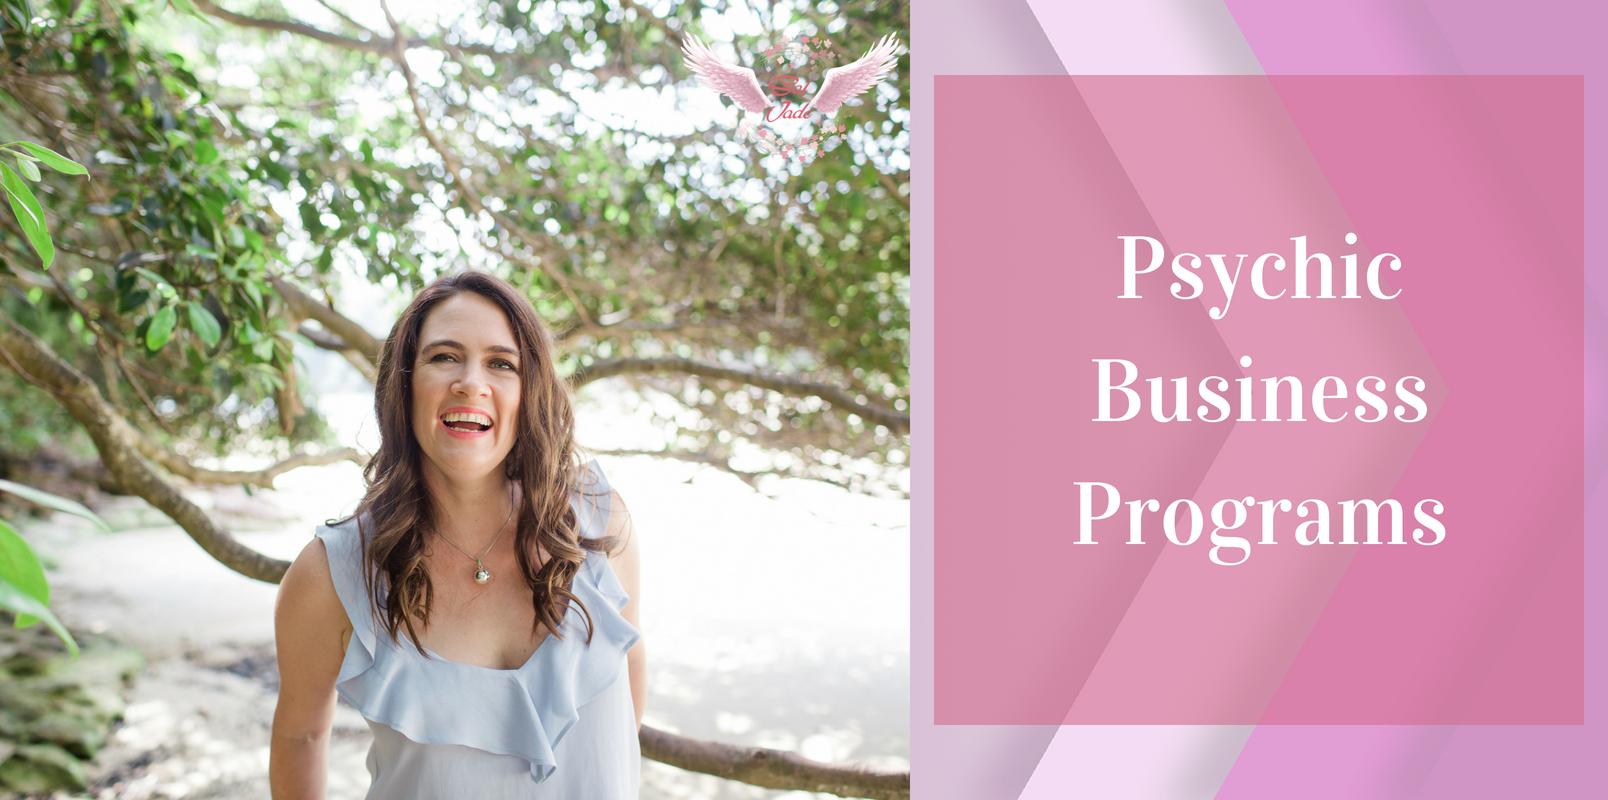 Psychic Business Programs | Sal Jade